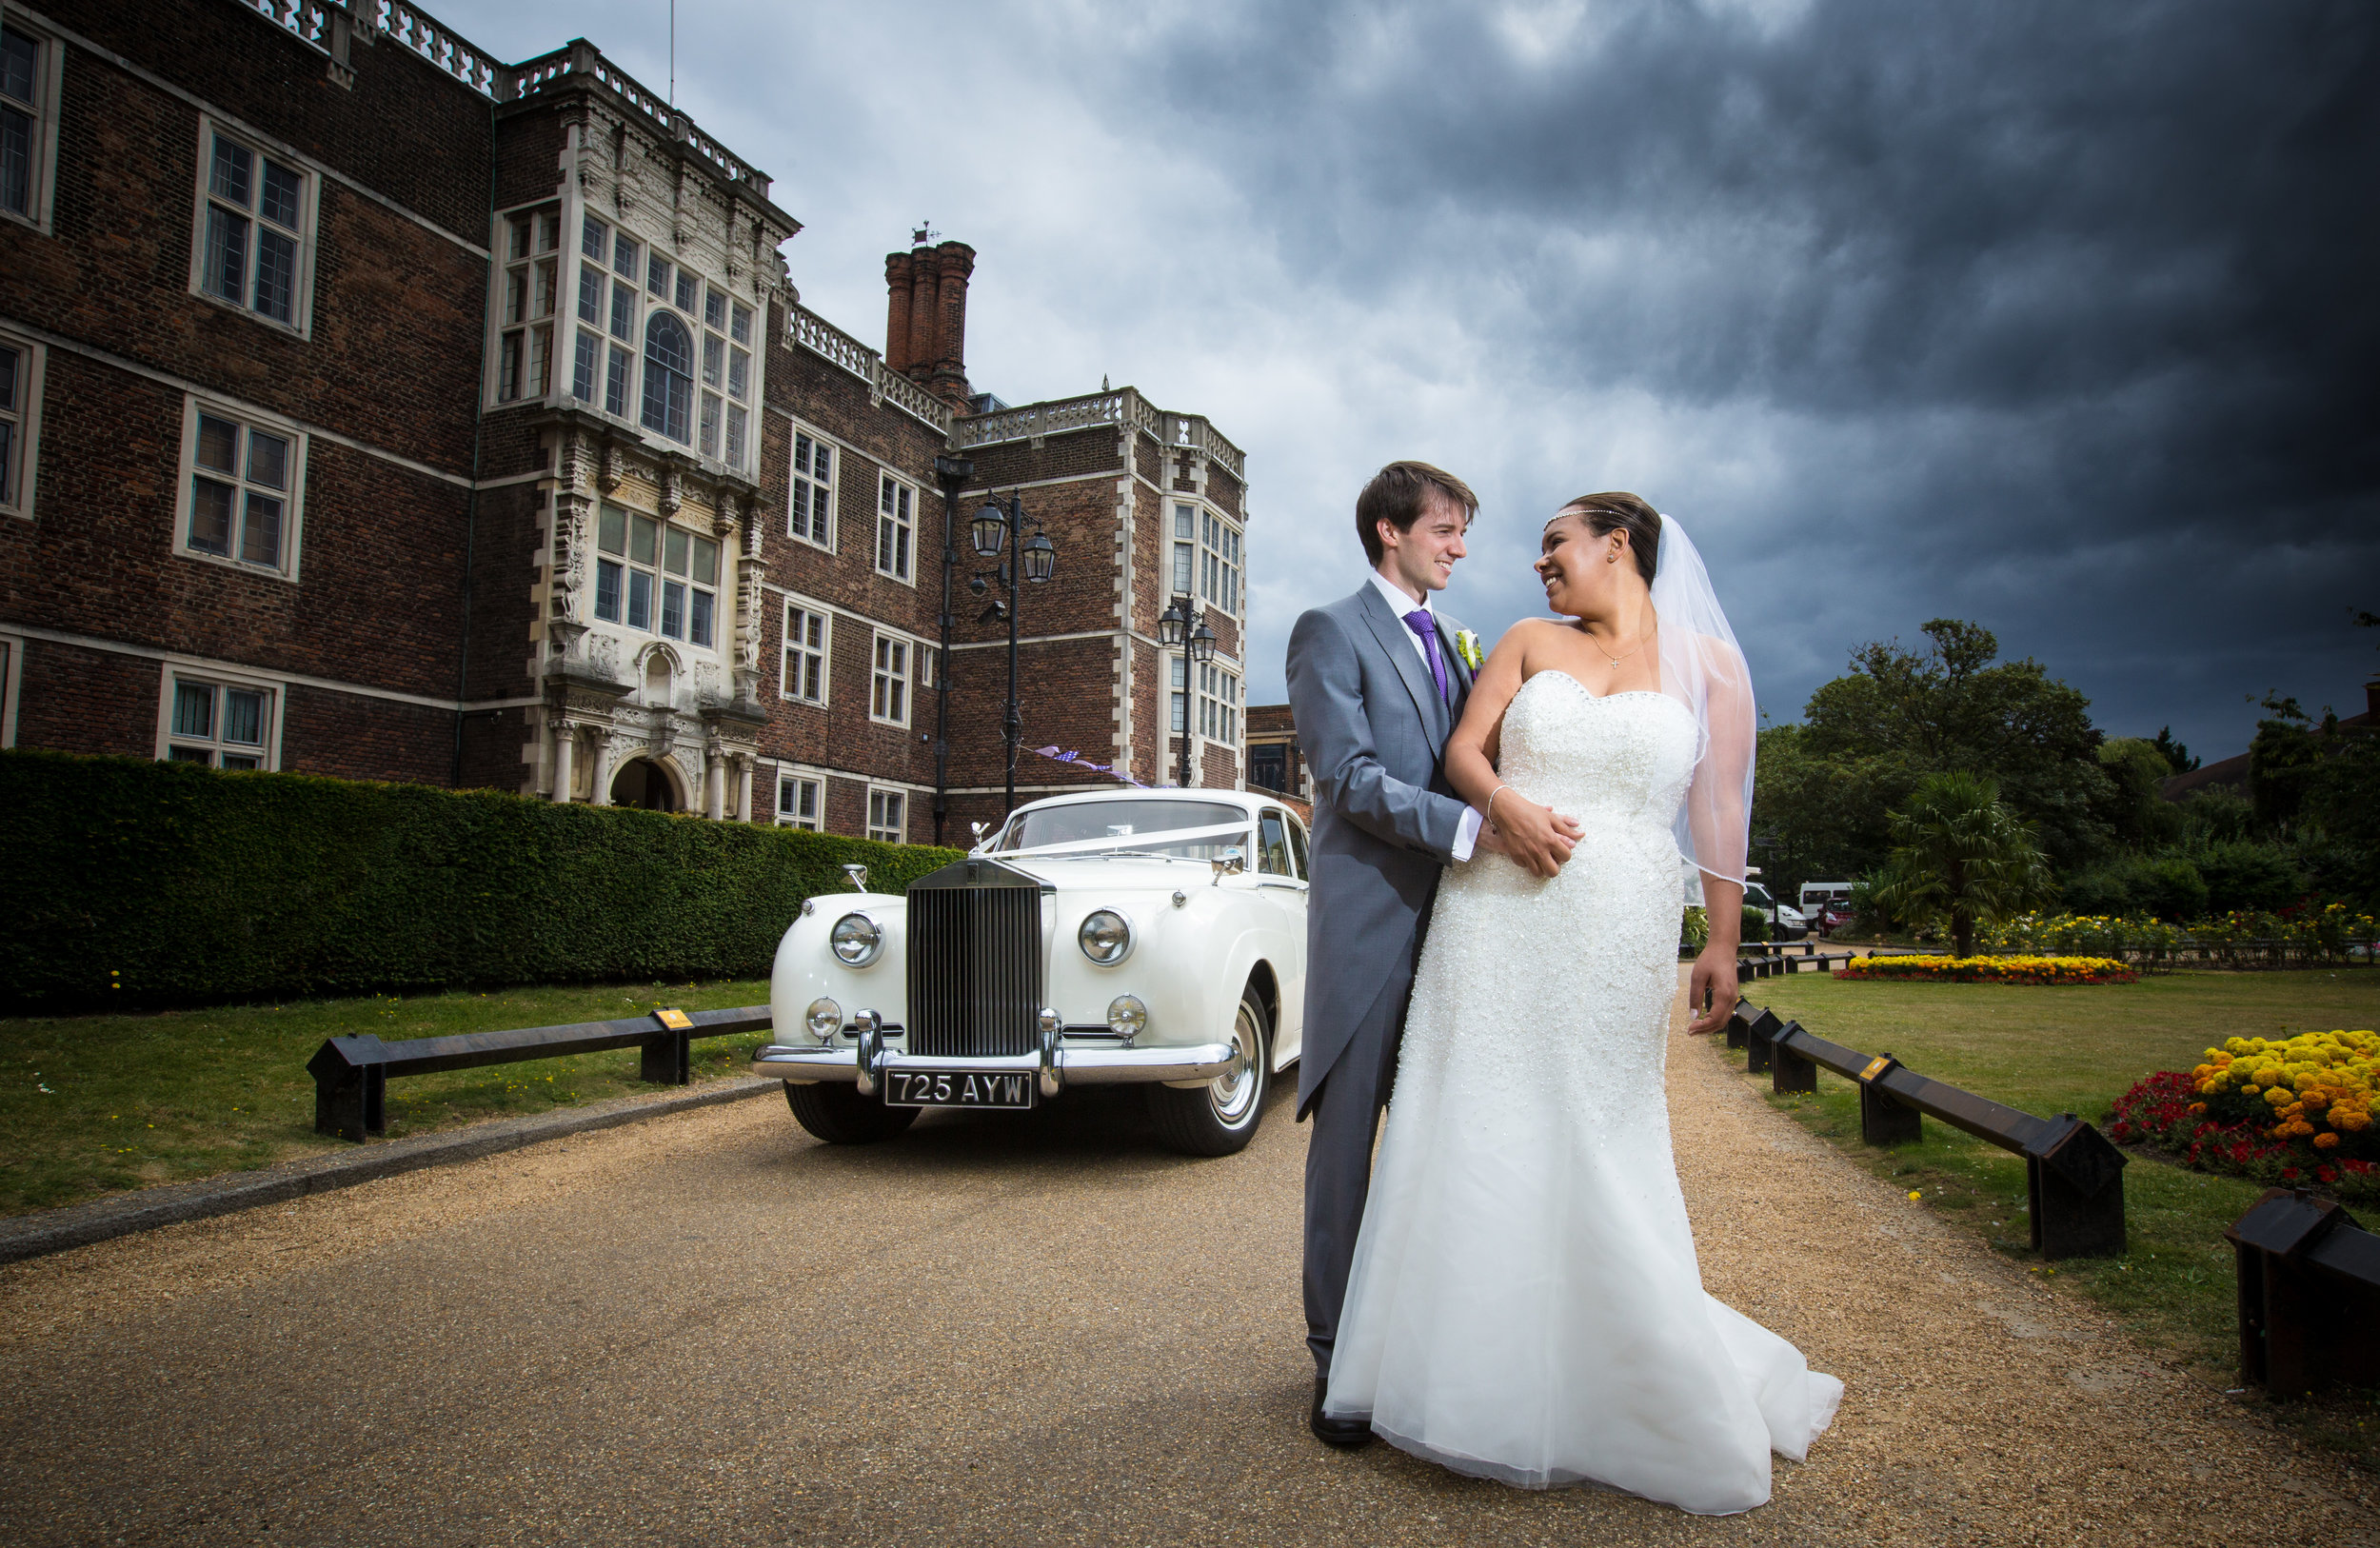 Saint-Alfege-Church-greenwich-wedding-charlton-house-london-rolls-royce-190